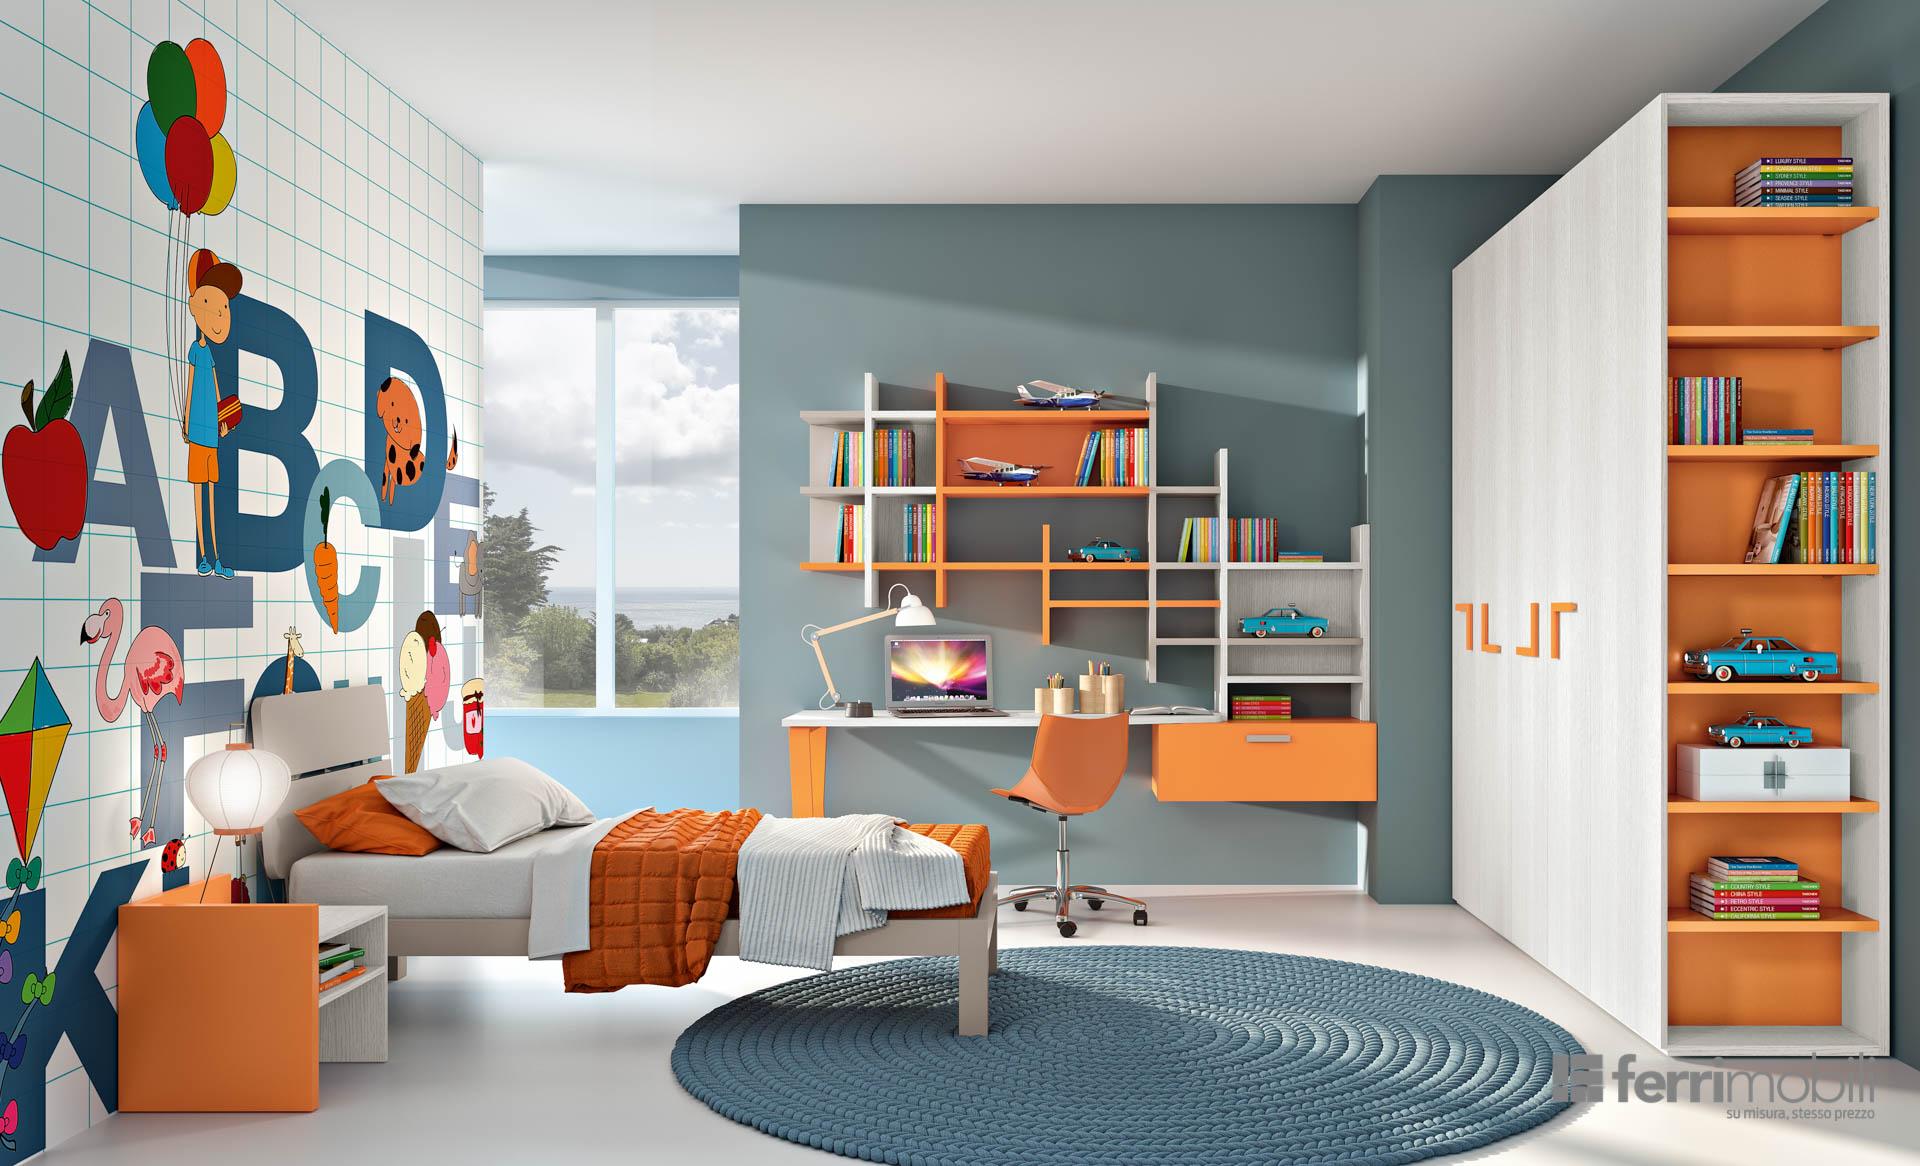 Idee Per Camere Ragazzi camera ragazzi : idee per i nostri figli